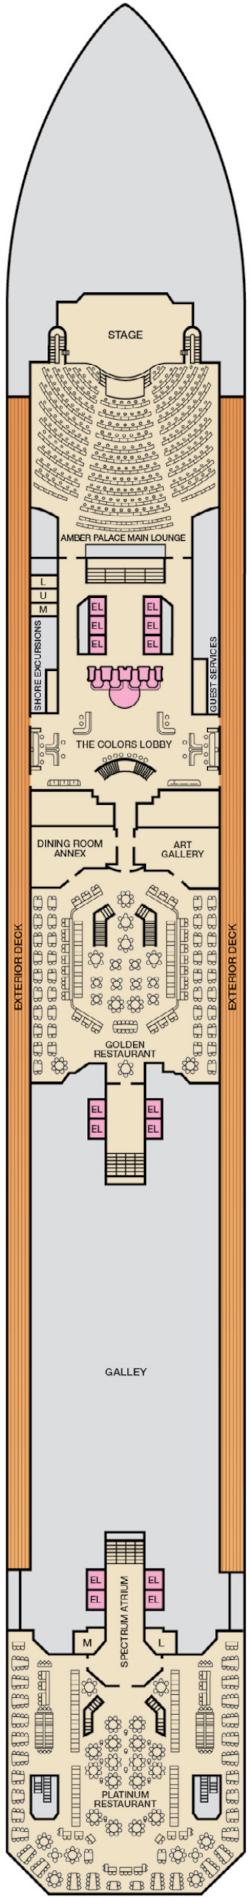 Carnival Glory Lobby Deck Deck Plan